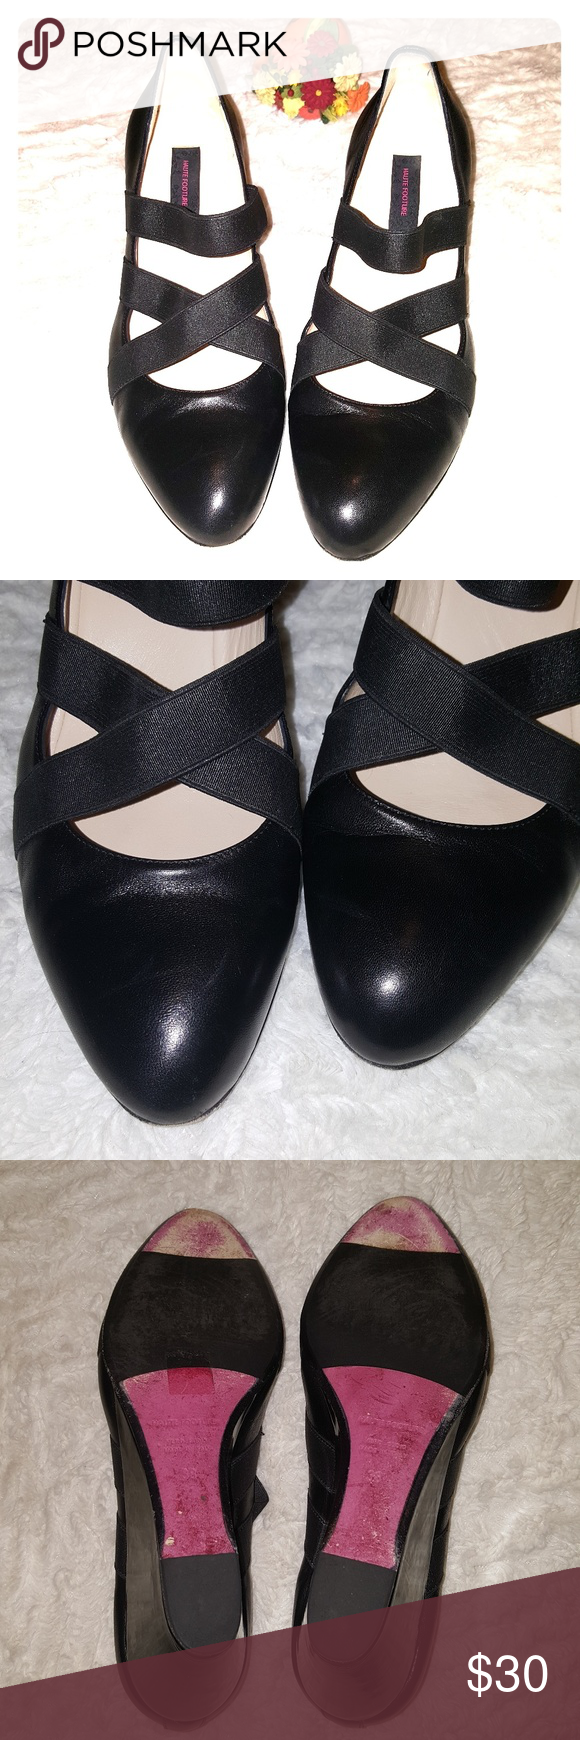 Haute Footure by Taryn Toe Rose Closed Toe Taryn Wedge Heel Made in Italy ... b44dc9